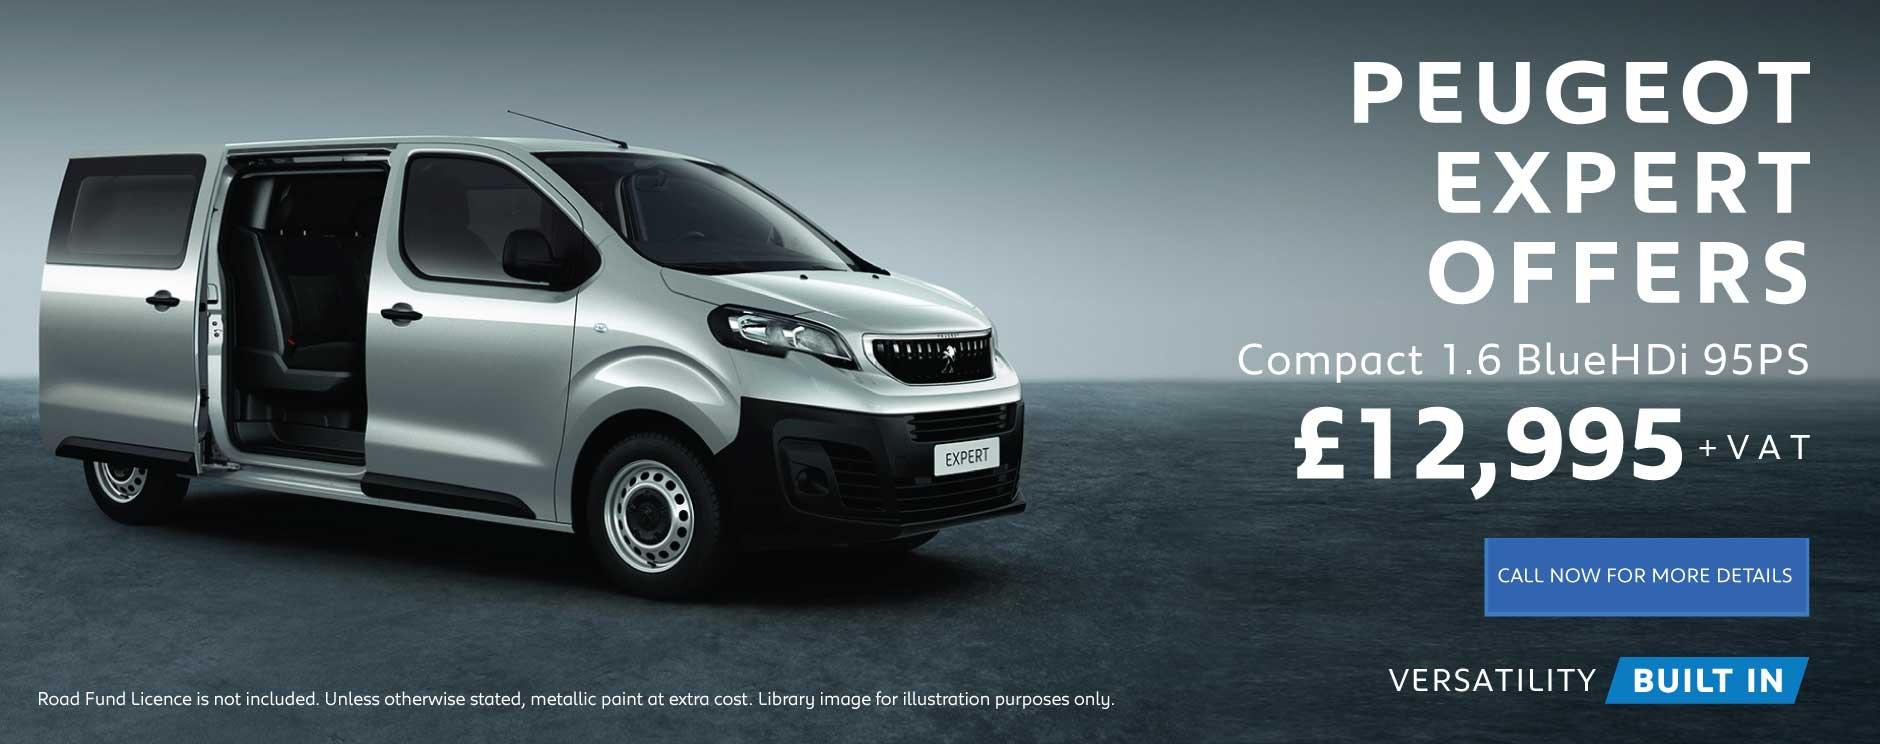 New Peugeot Vans for Sale | Bristol Street Motors